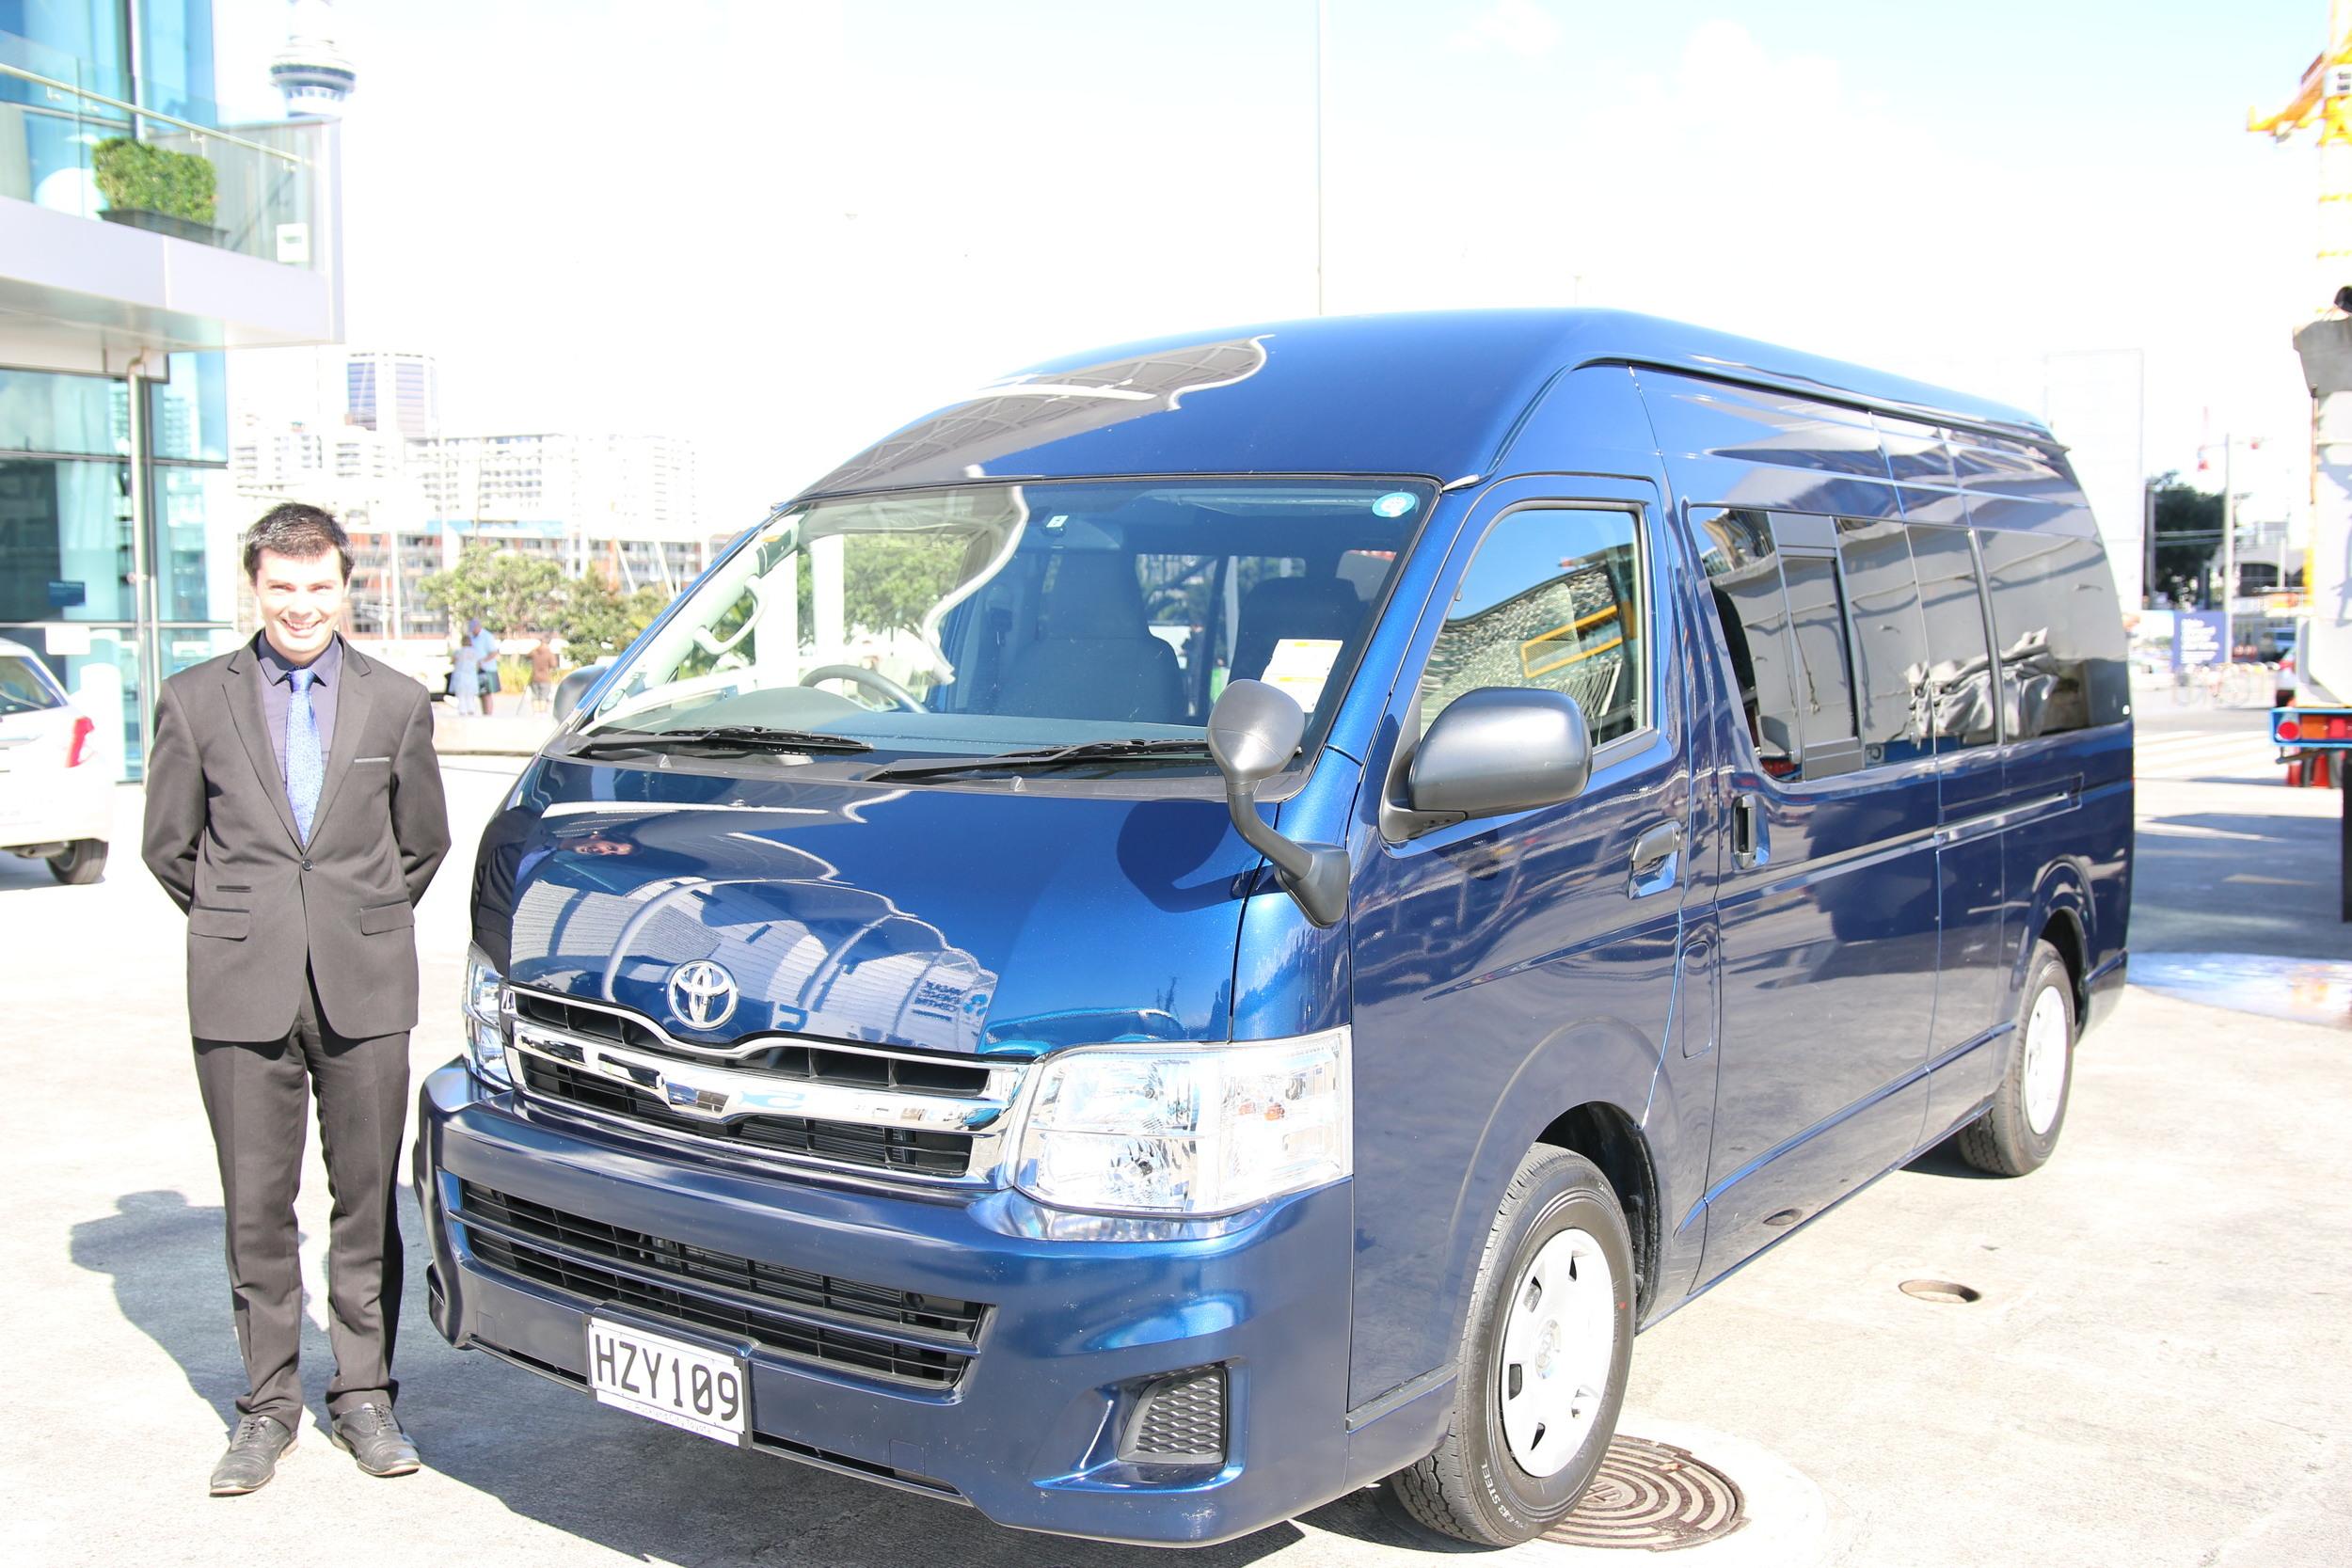 Copy of Driver Stuart & 11 Passenger Minivan